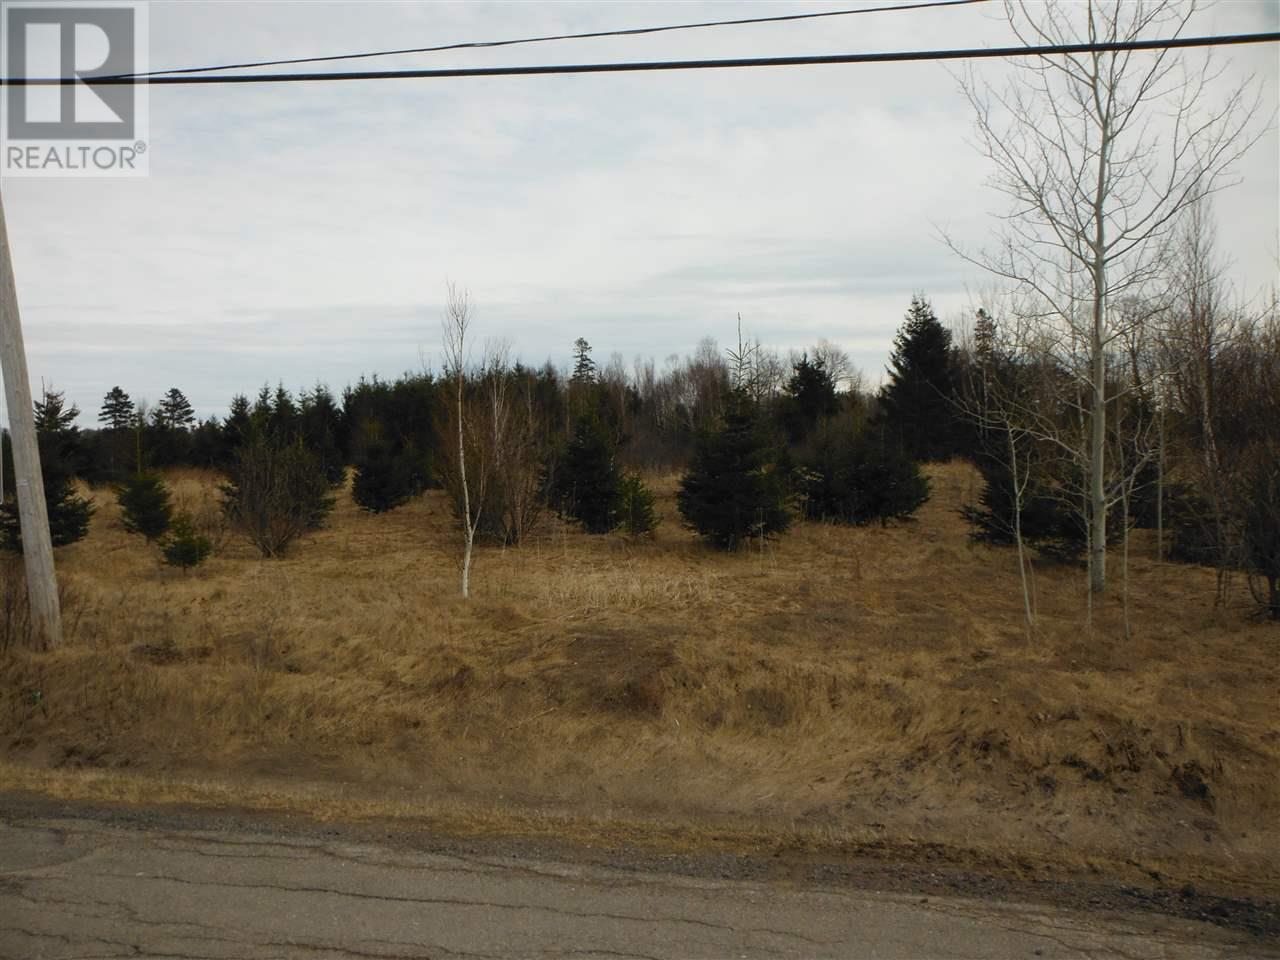 Lot 1-16 Royalty Junction Road, Charlottetown, Prince Edward Island  C1E 1Z2 - Photo 5 - 202006111